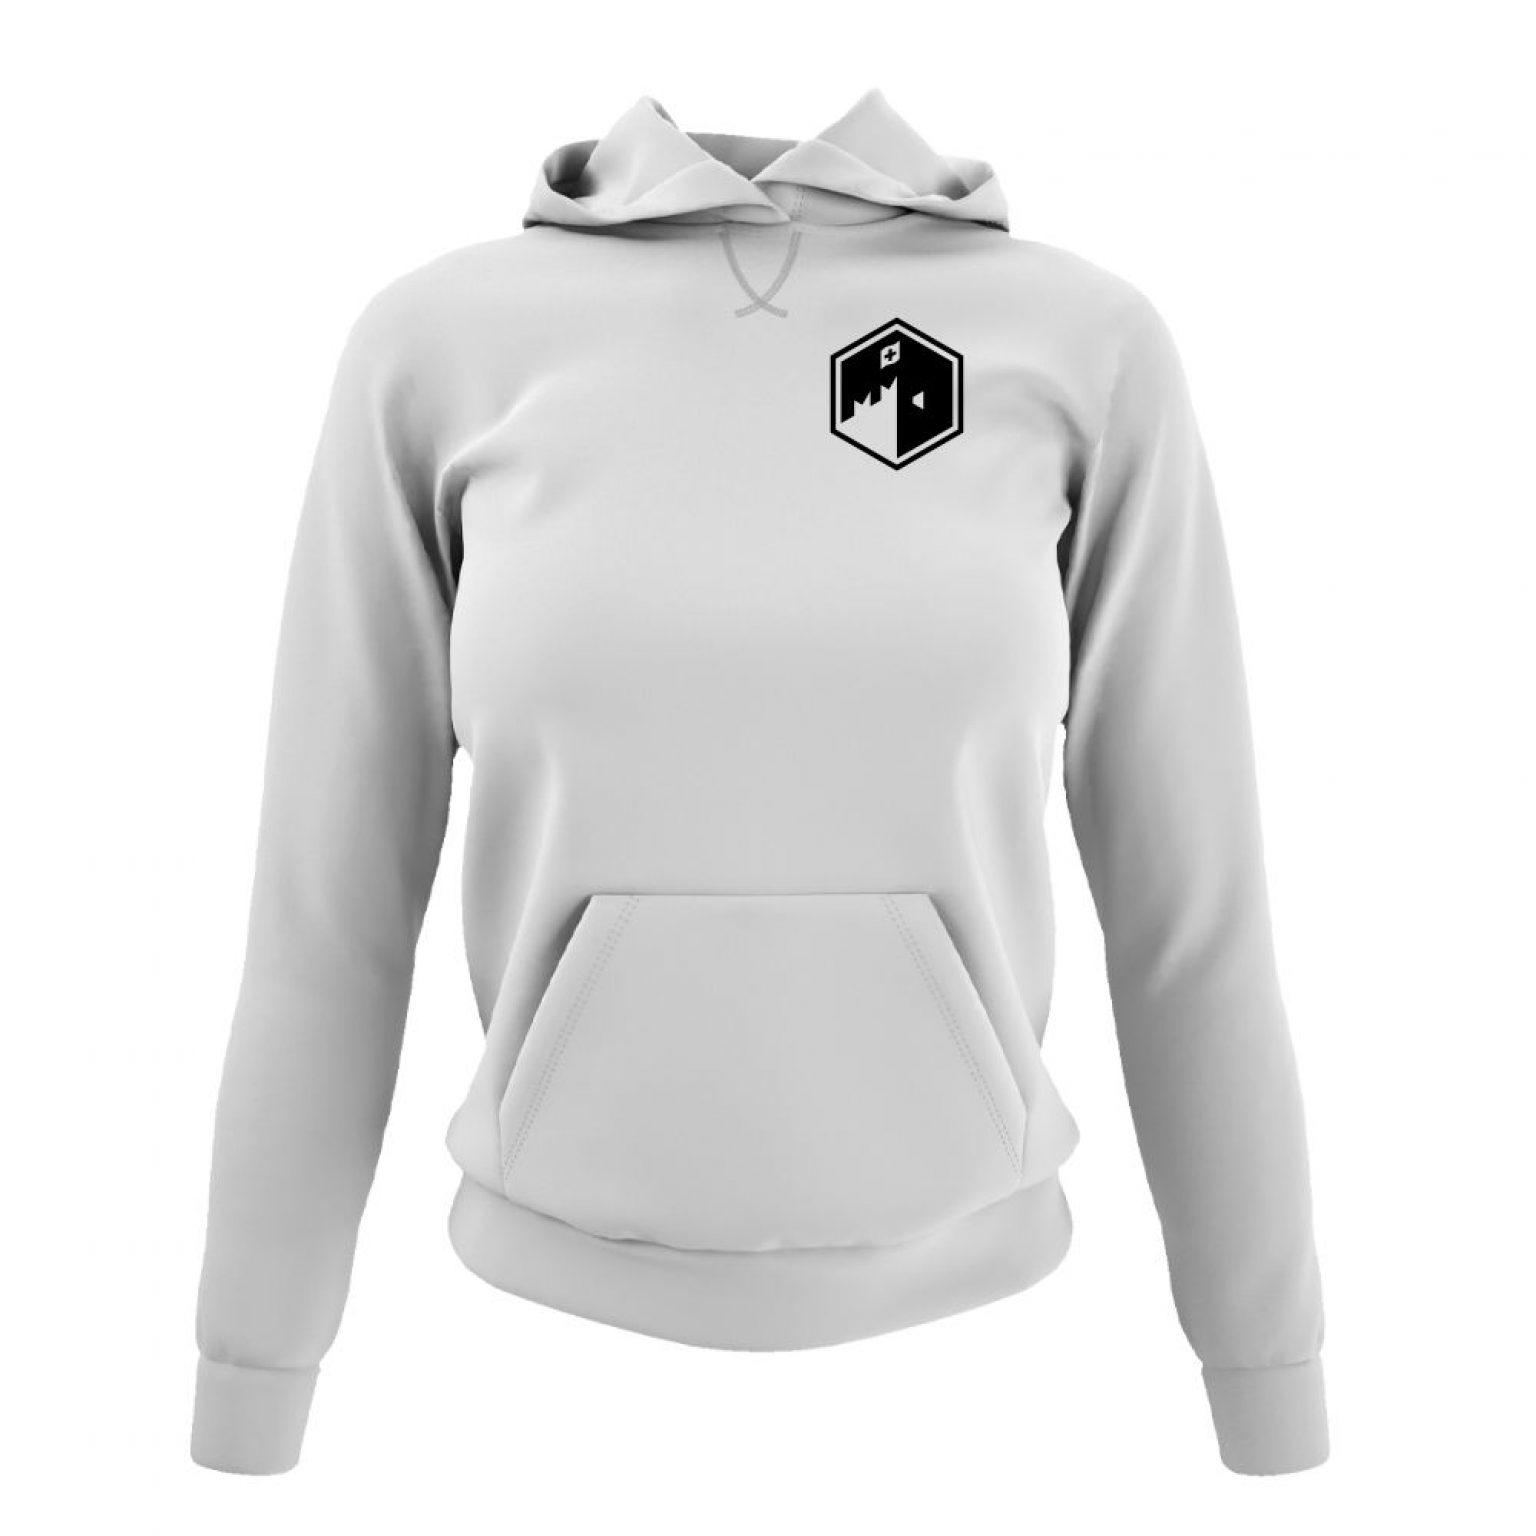 CFB hoodie damen white front